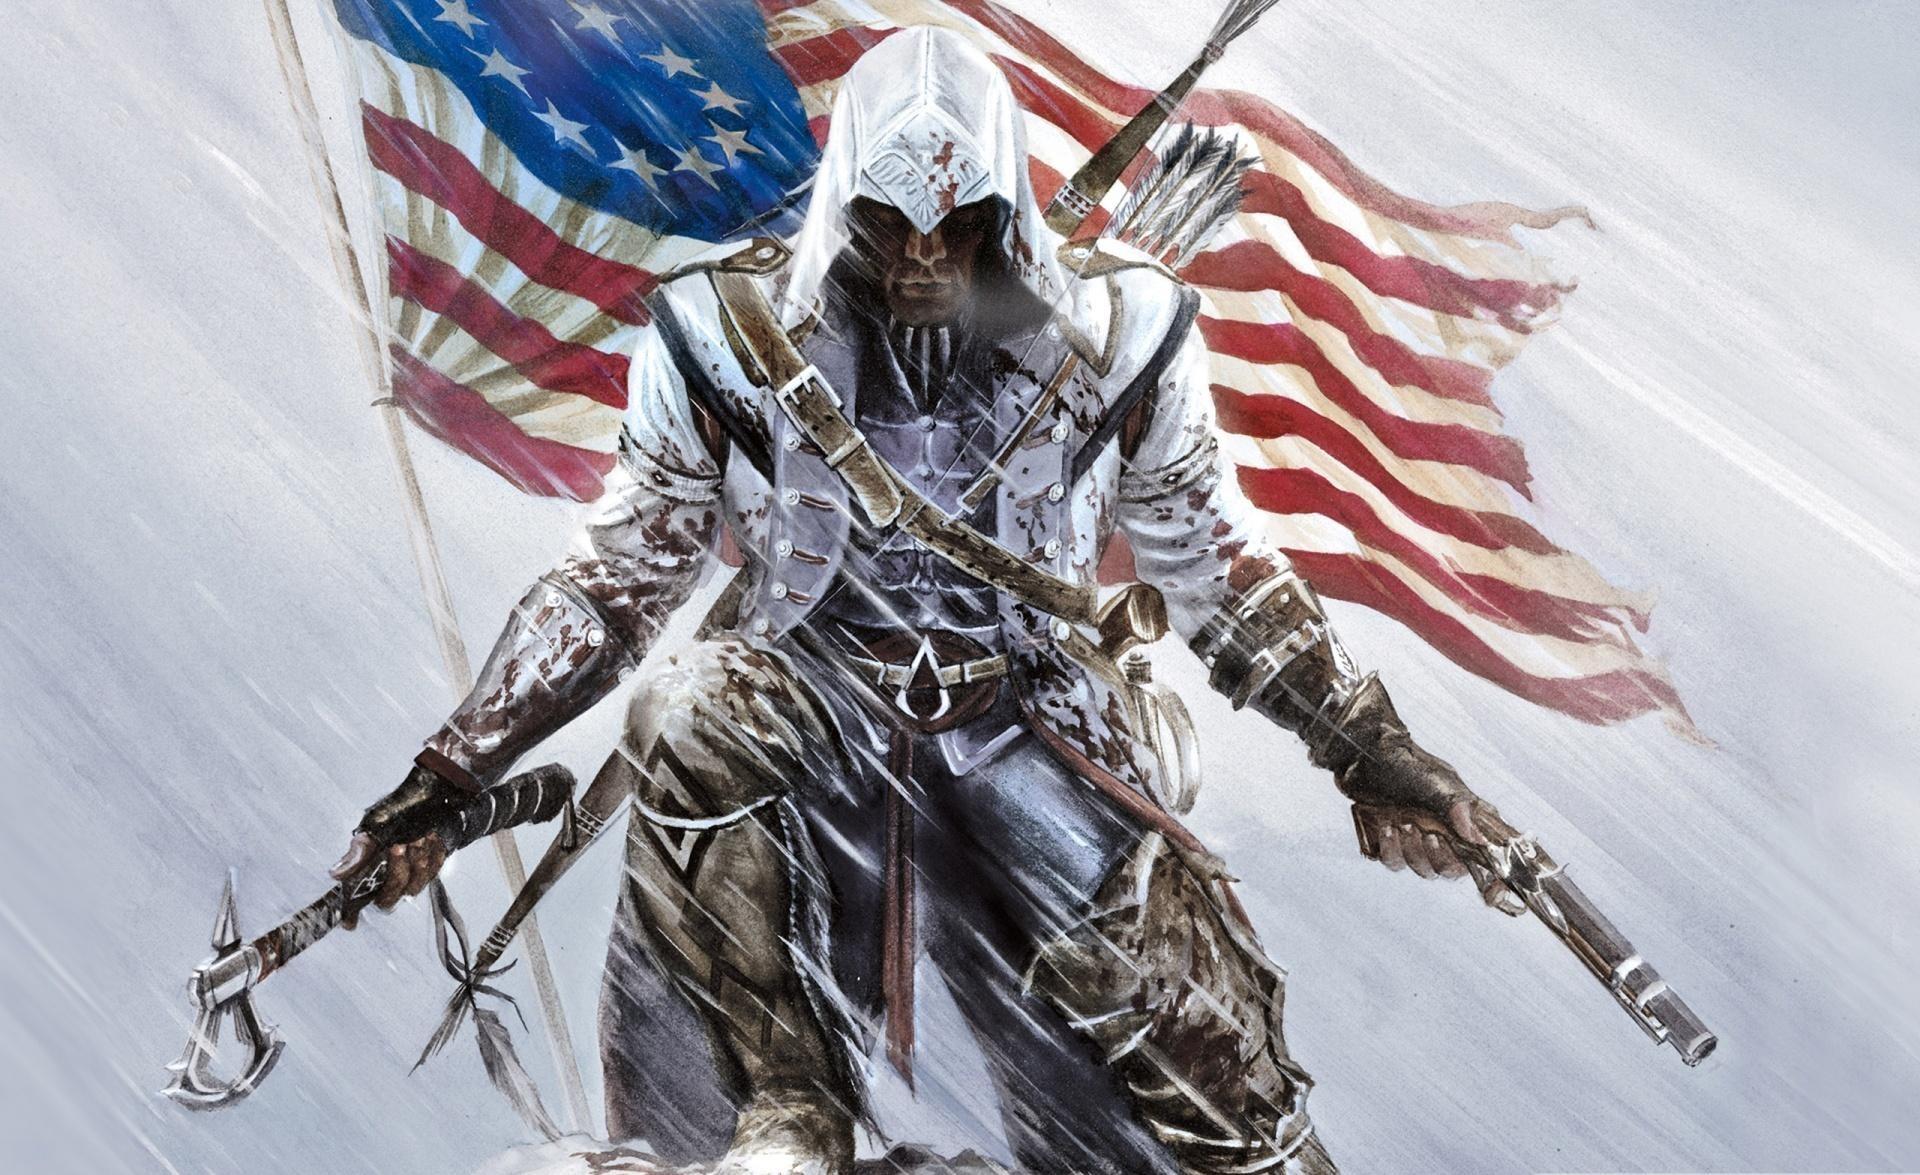 American Flag Wallpaper | HD Wallpapers | Pinterest | American flag  wallpaper